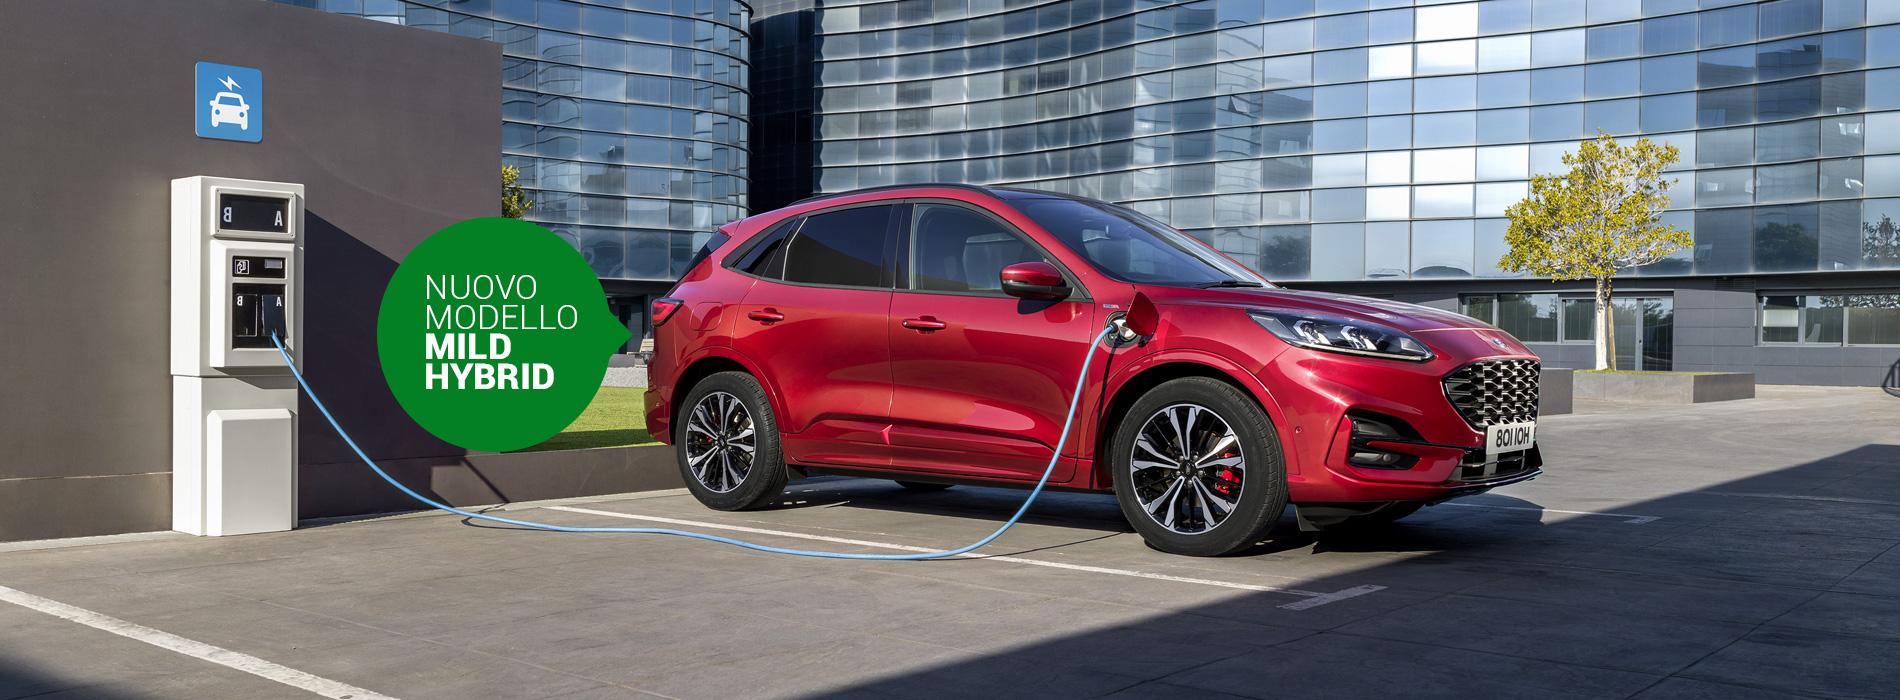 Ford Kuga MHEV, nuova Mild Hybrid dell'ovale blu